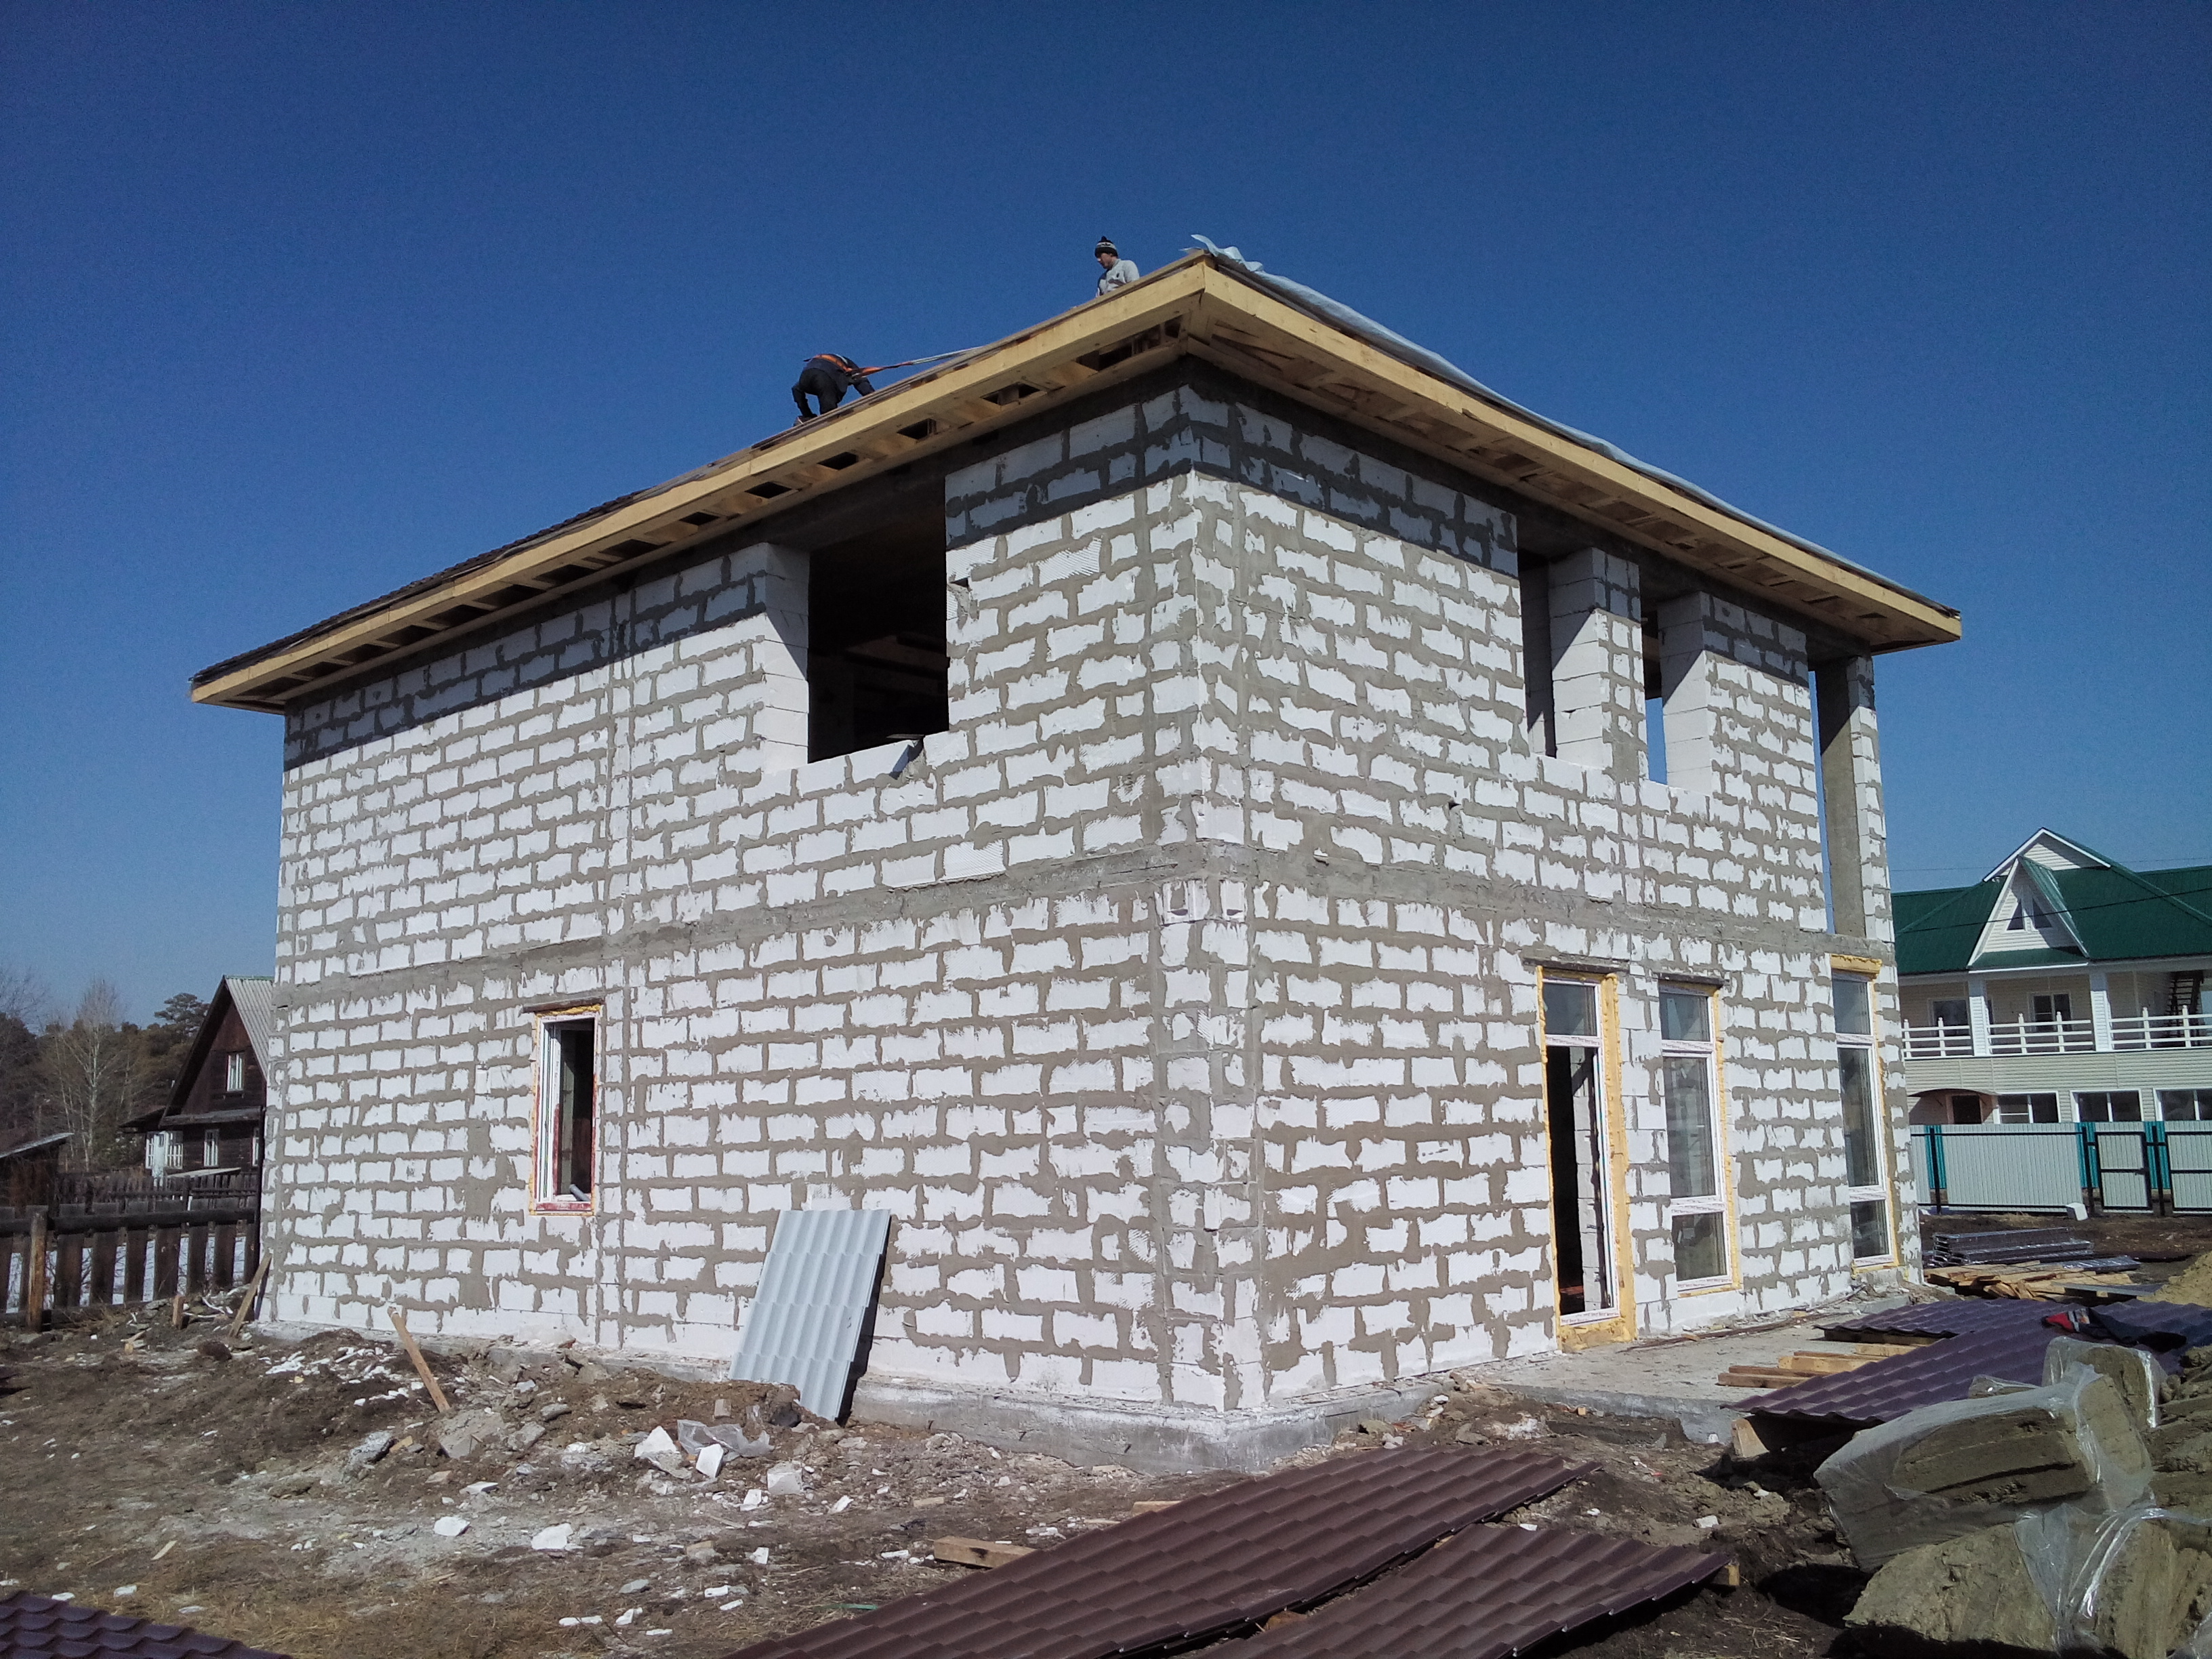 Koľko stojí za výstavbu domu z pórobetónu v Irkutsku